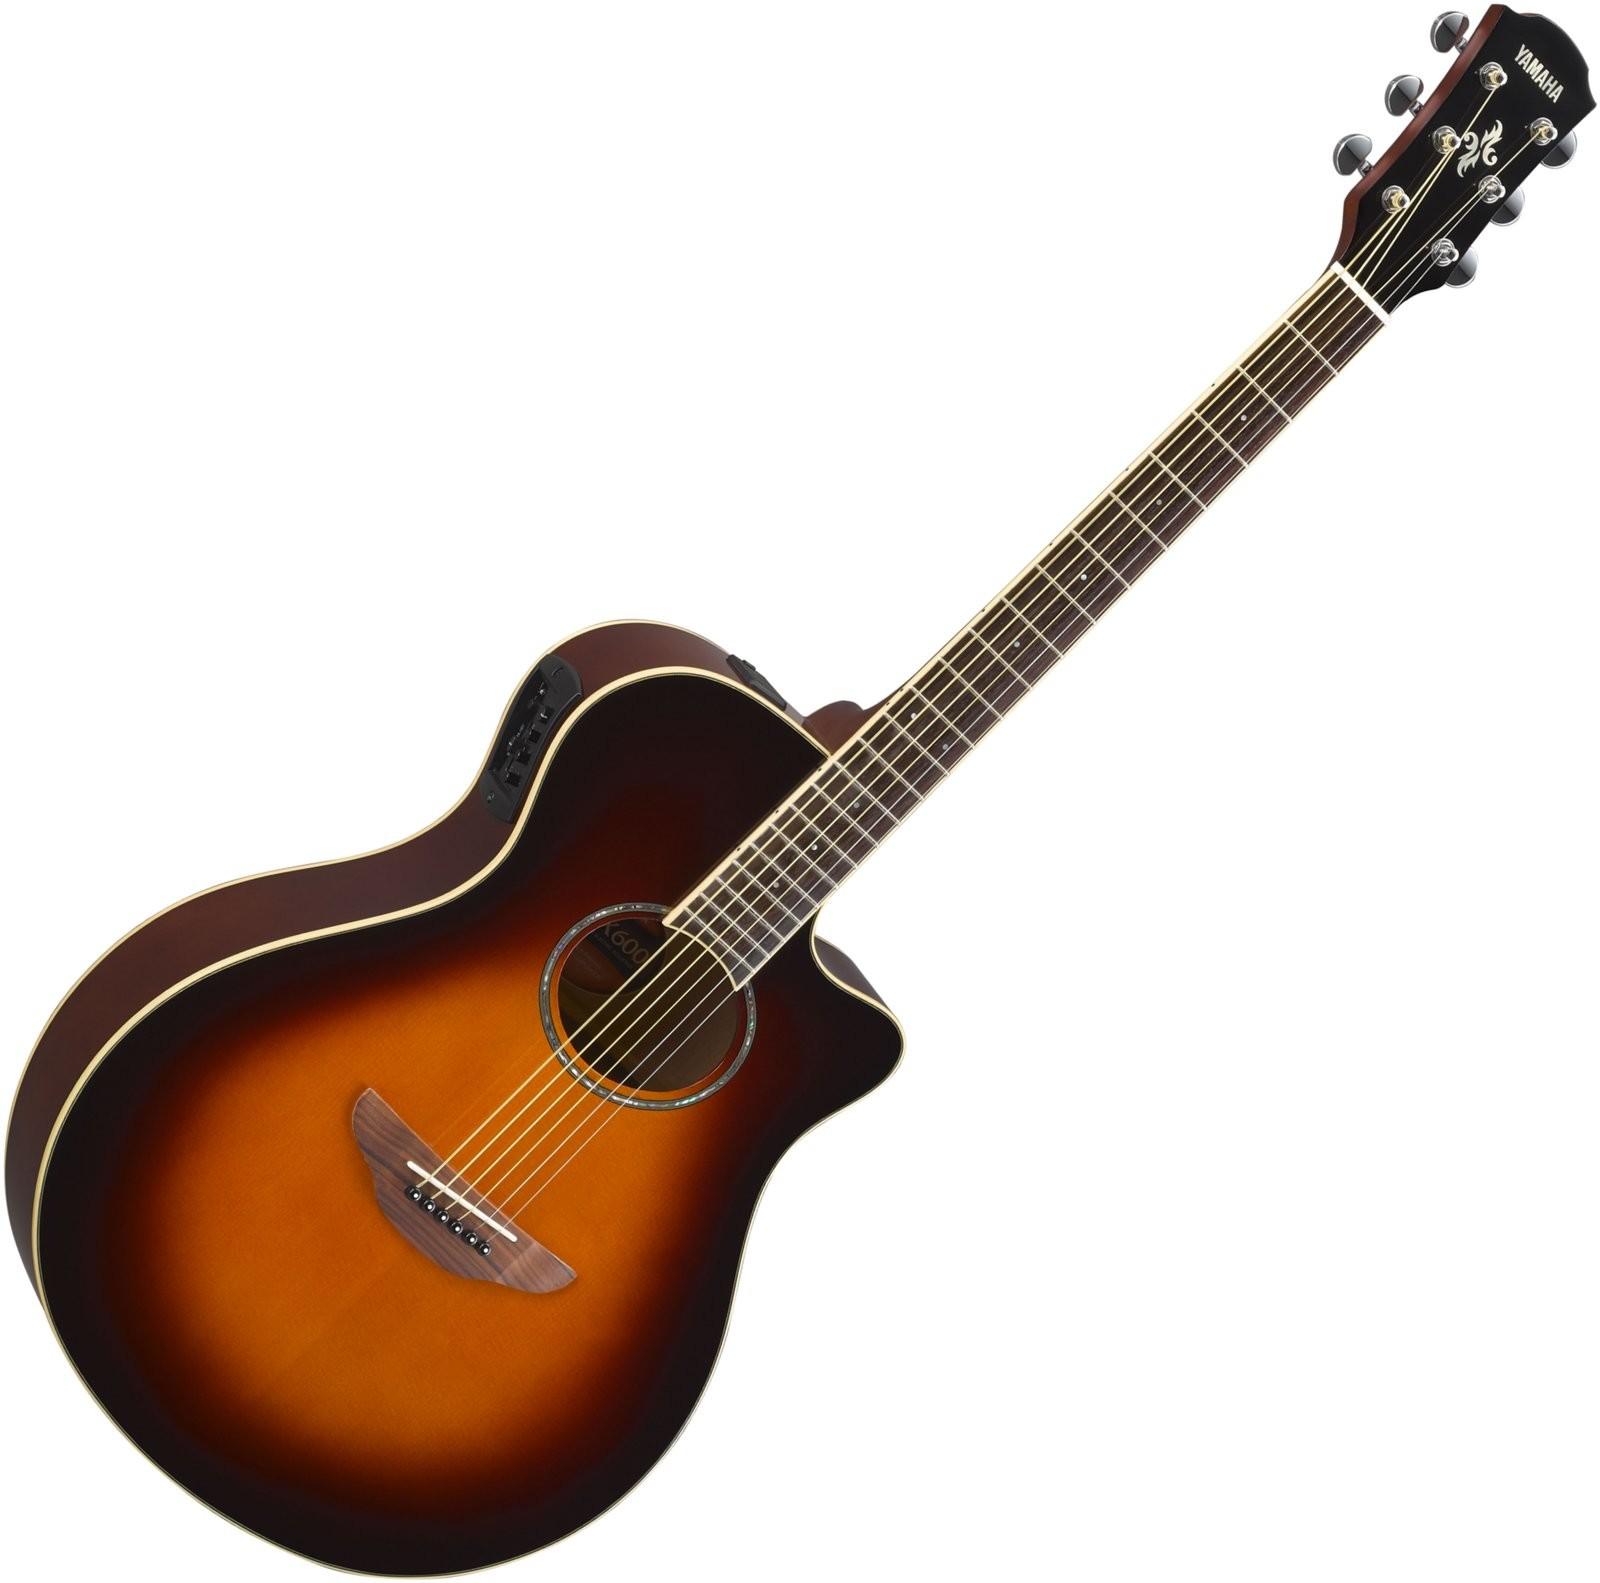 Yamaha CPX600 Old Violin Sunburst